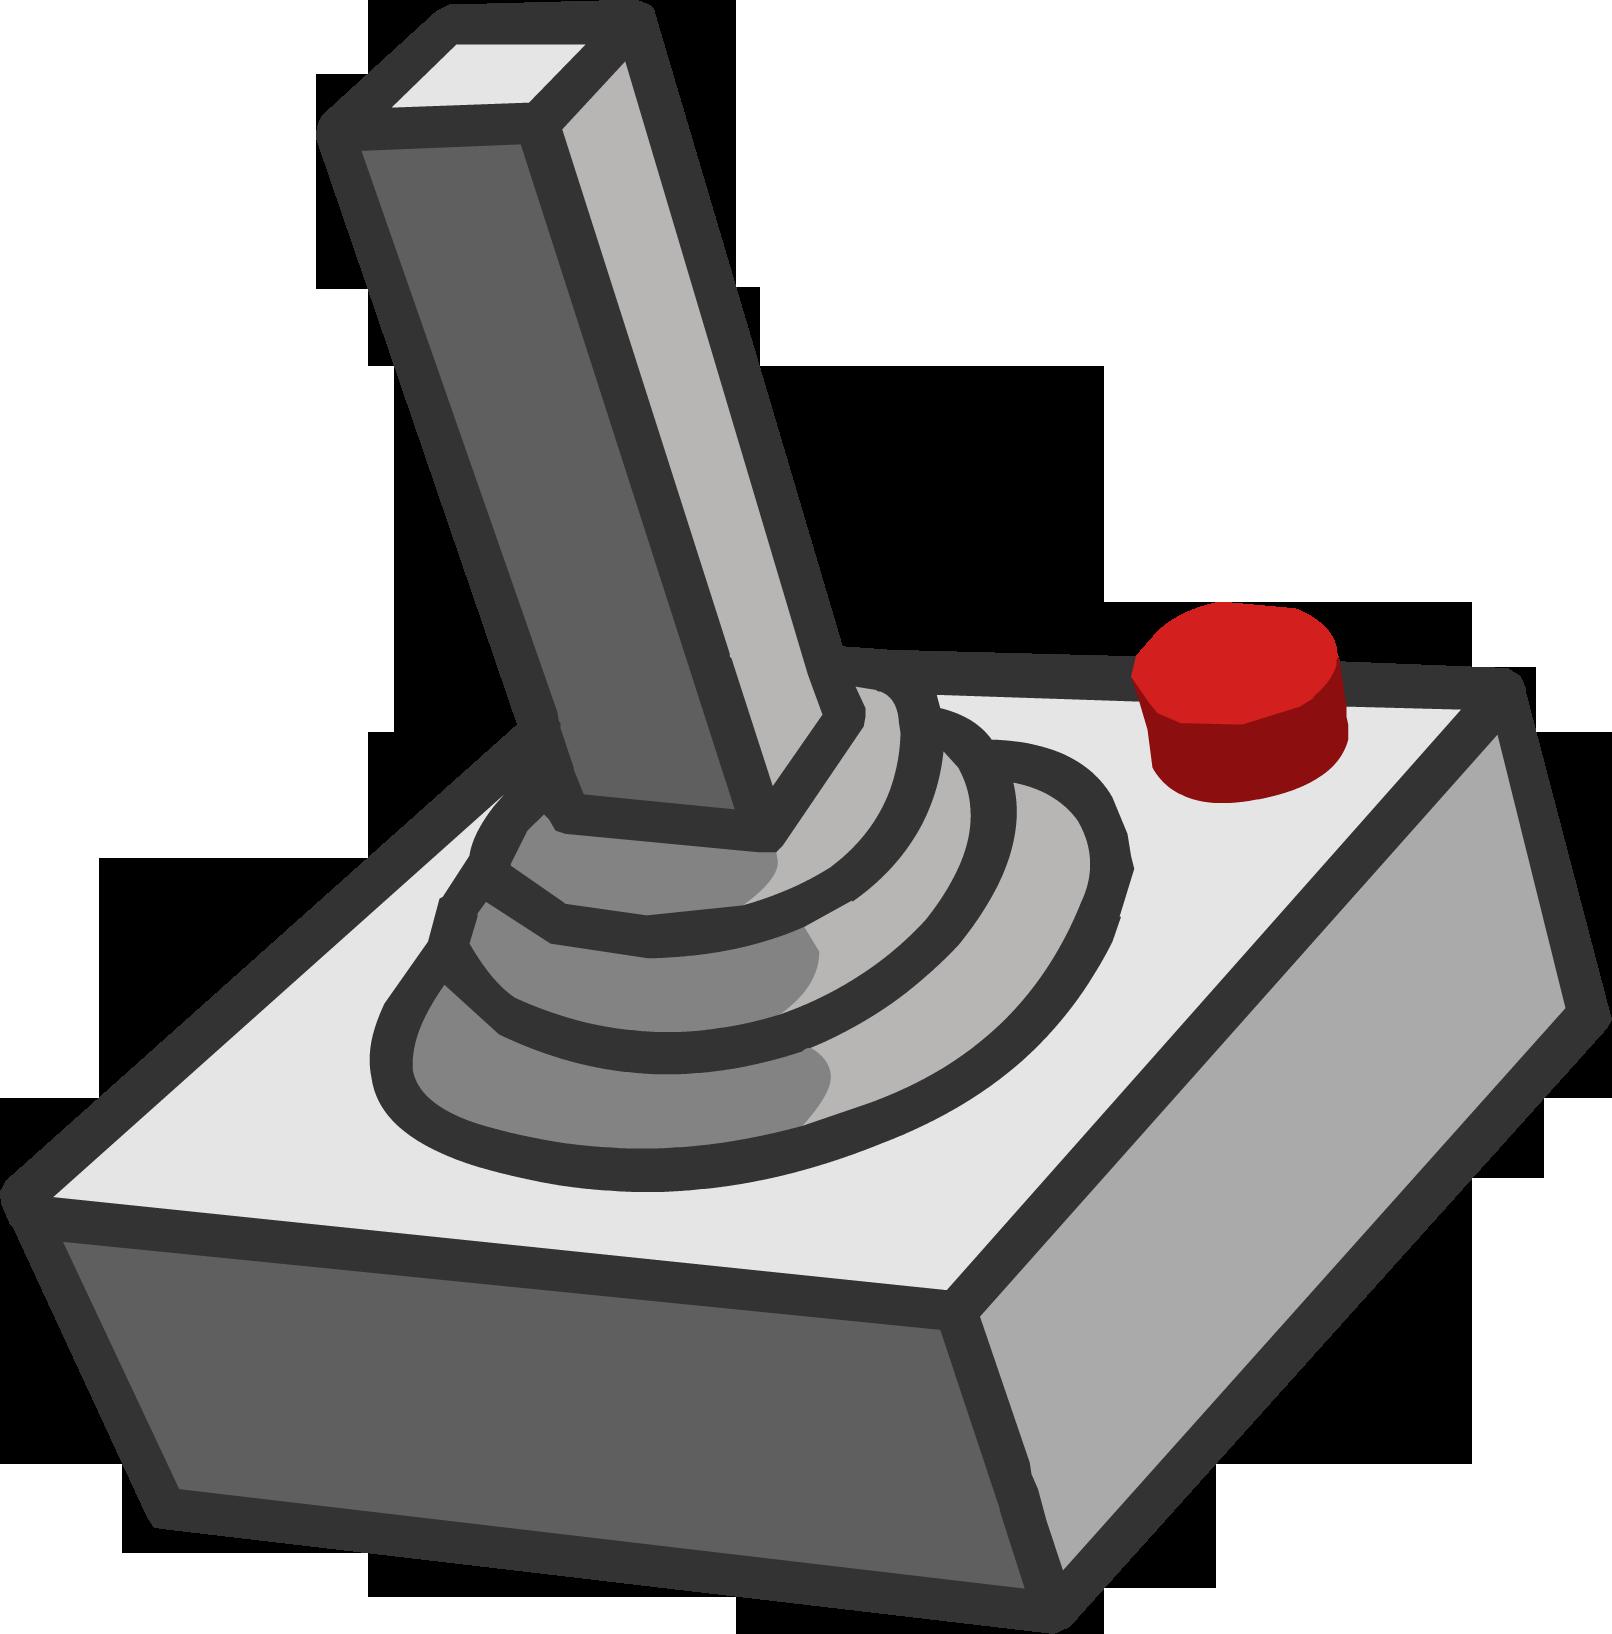 The fair prizes catalog. Gaming clipart joy stick